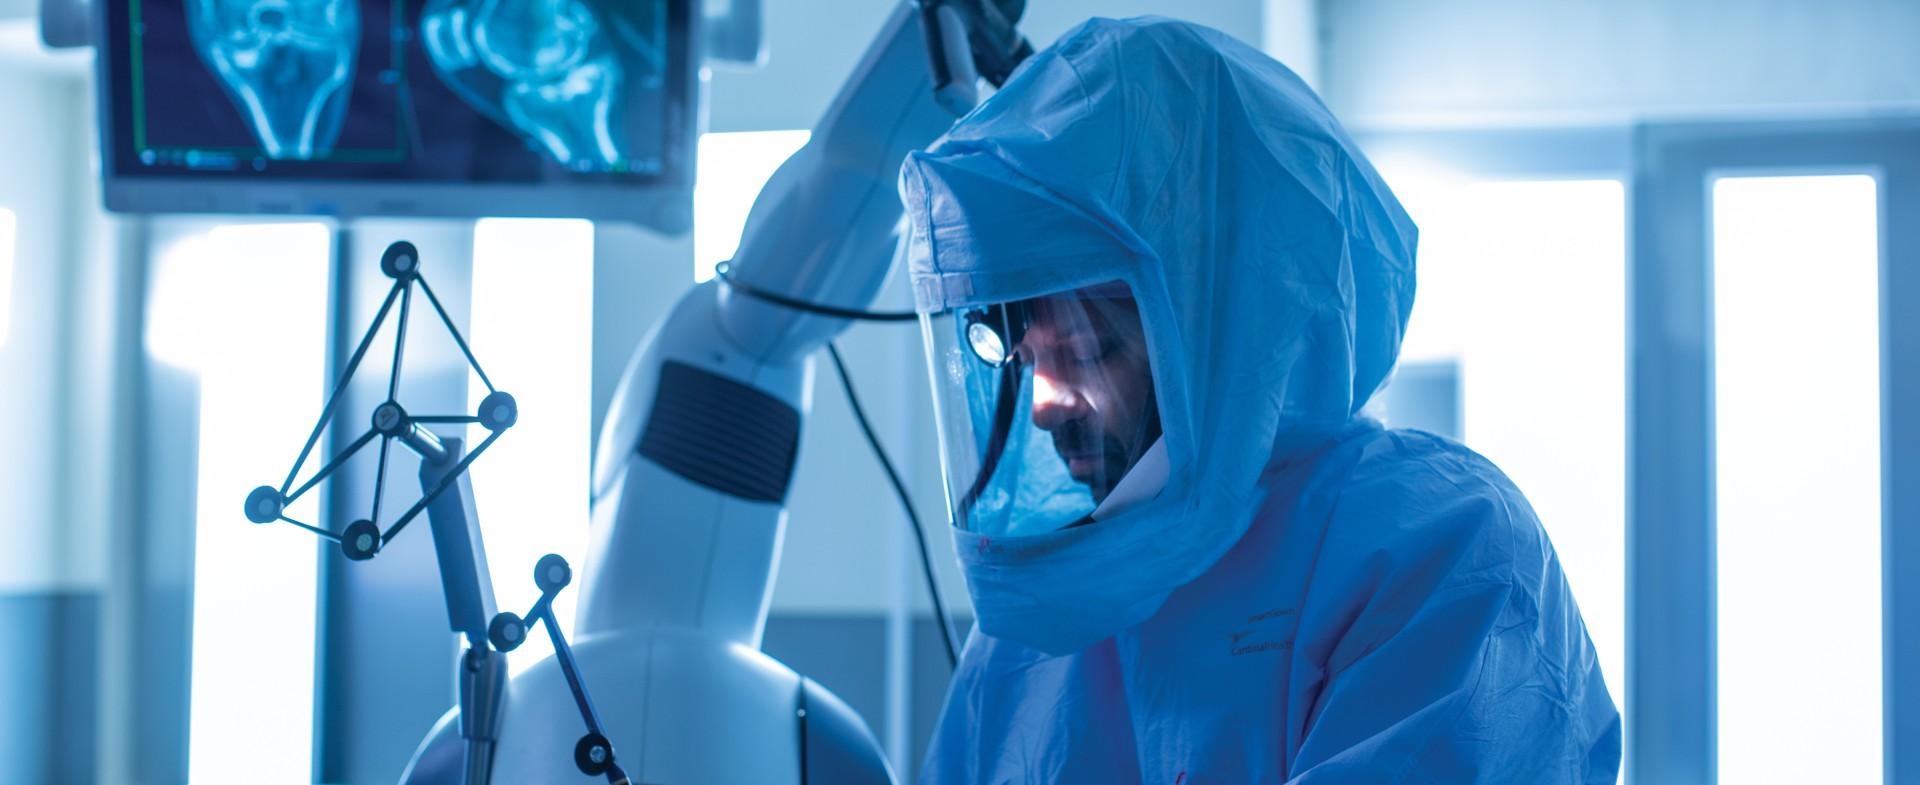 TGH orthopedic surgeon performing surgery